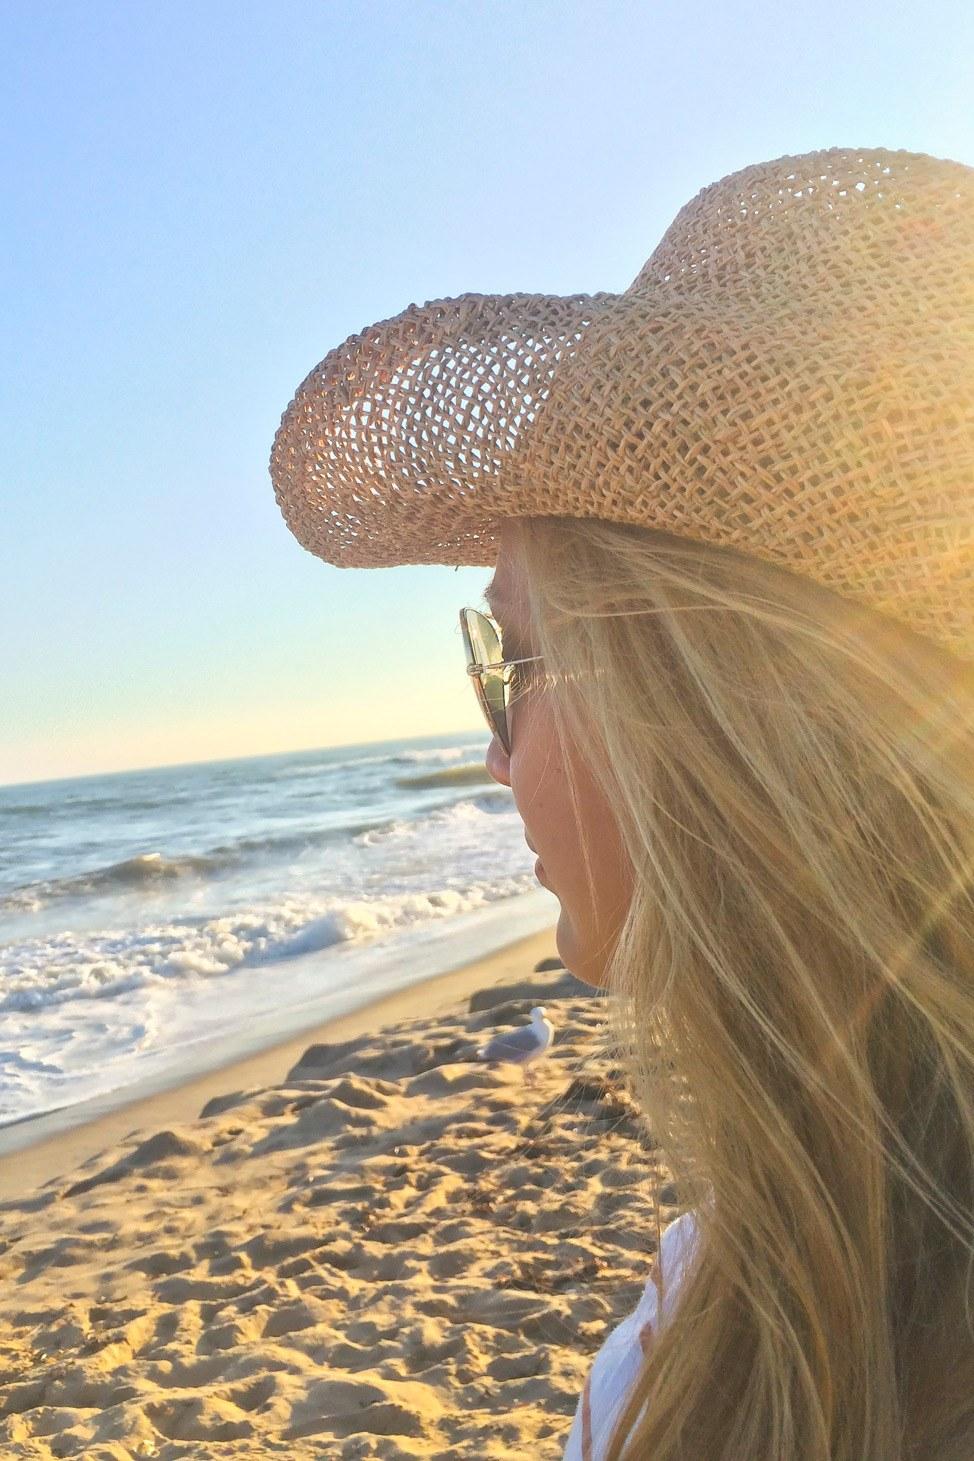 On the Beach in Martha's Vineyard